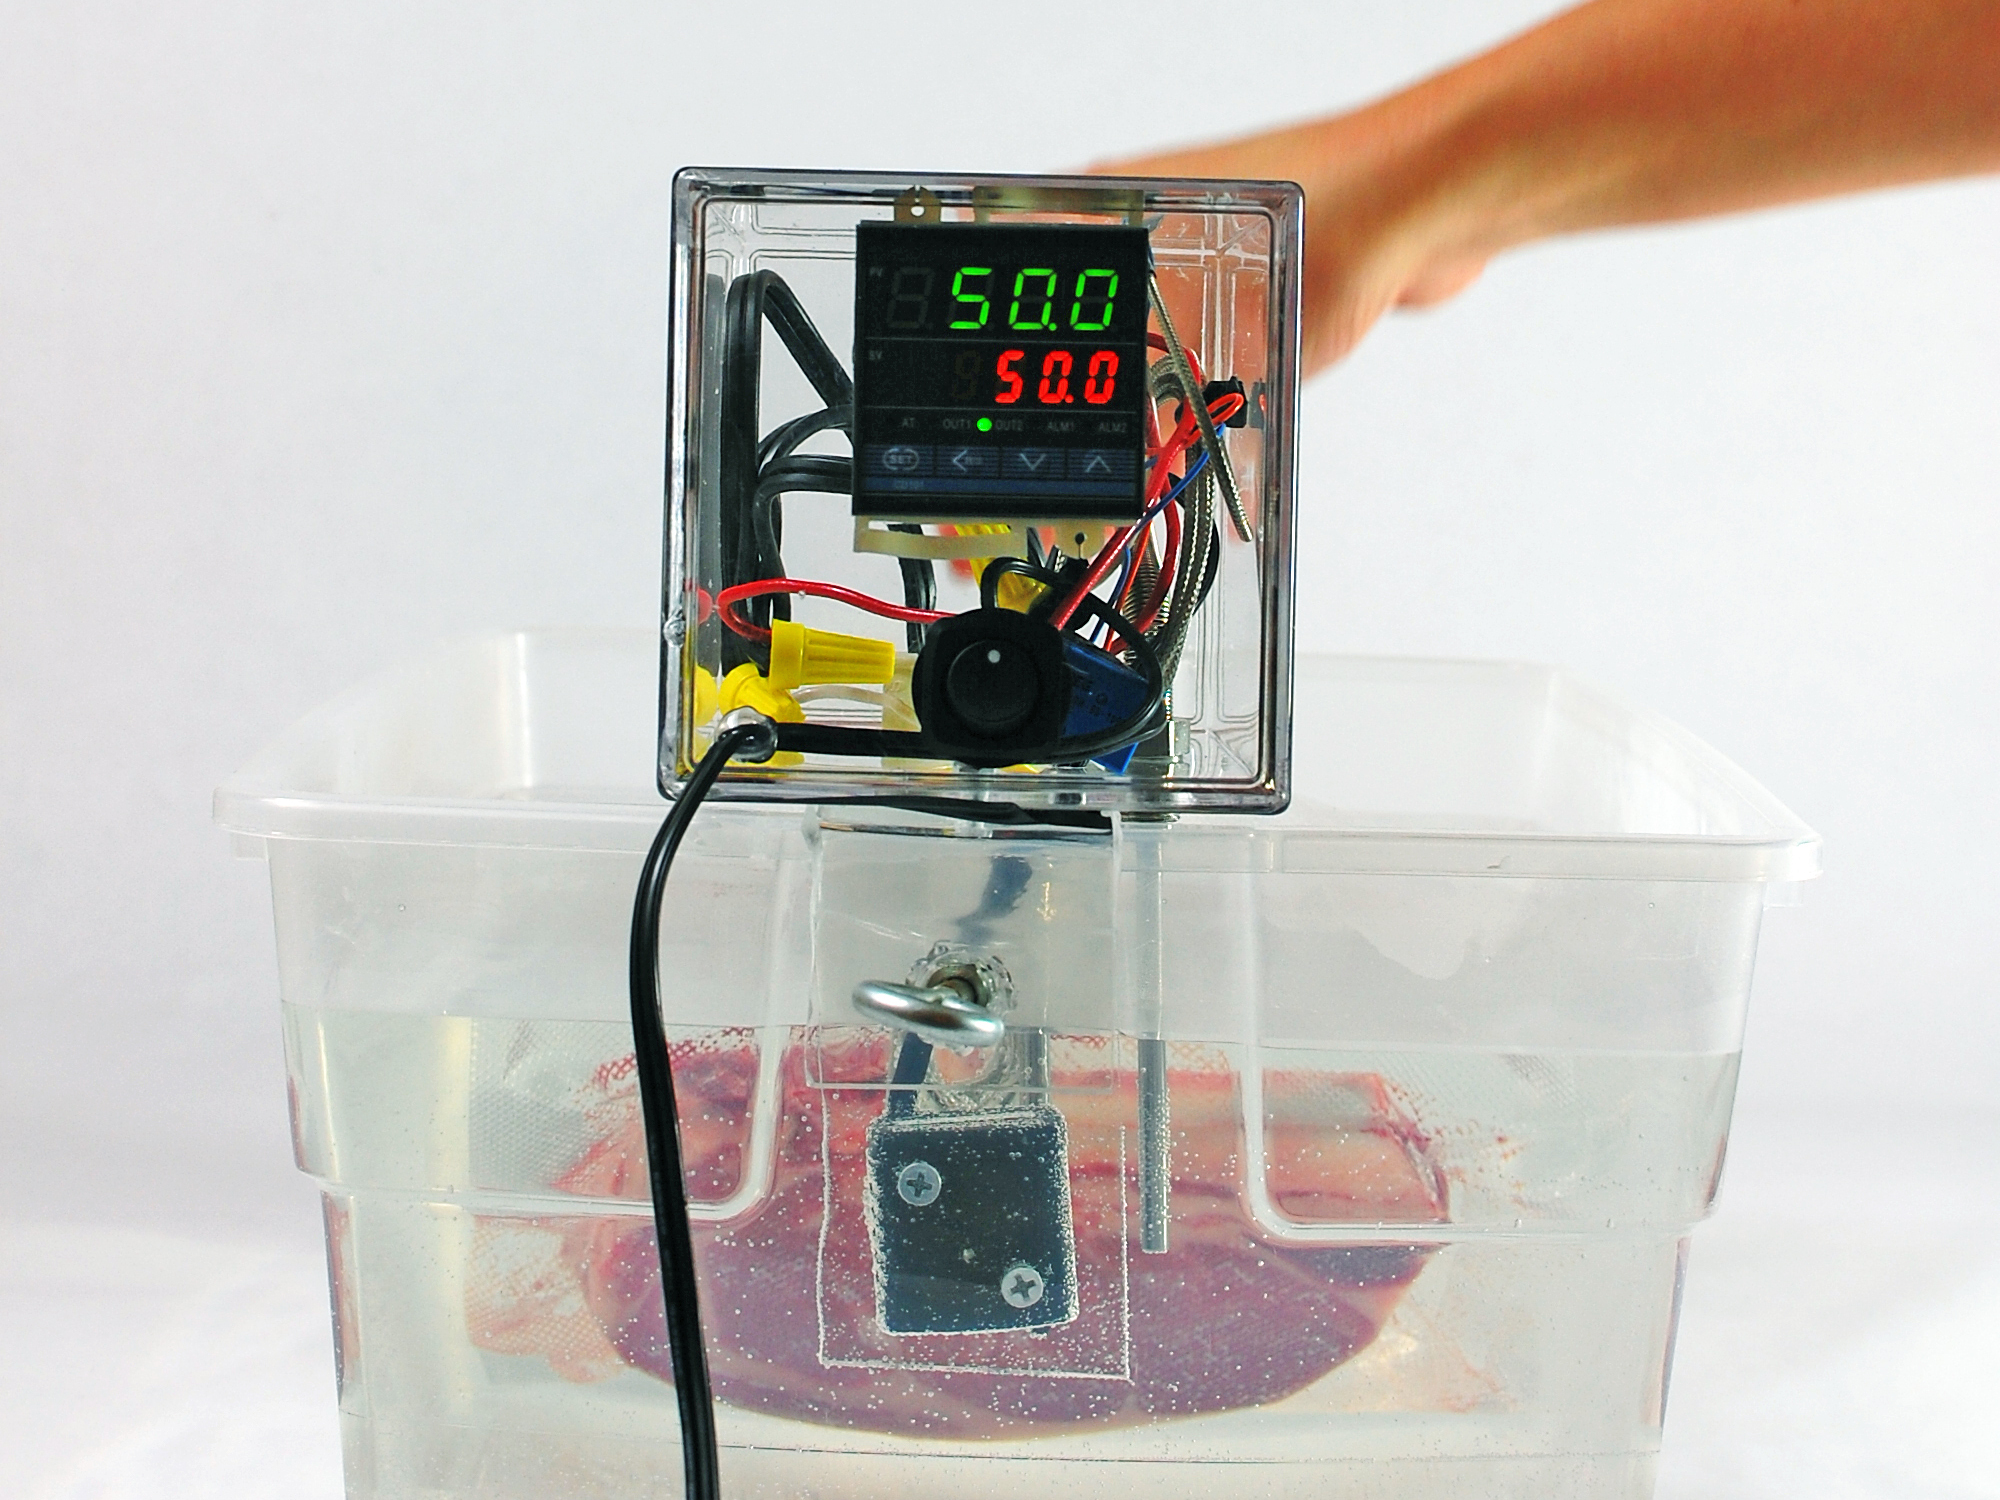 Build a $75 Sous Vide Immersion Cooker | Make: